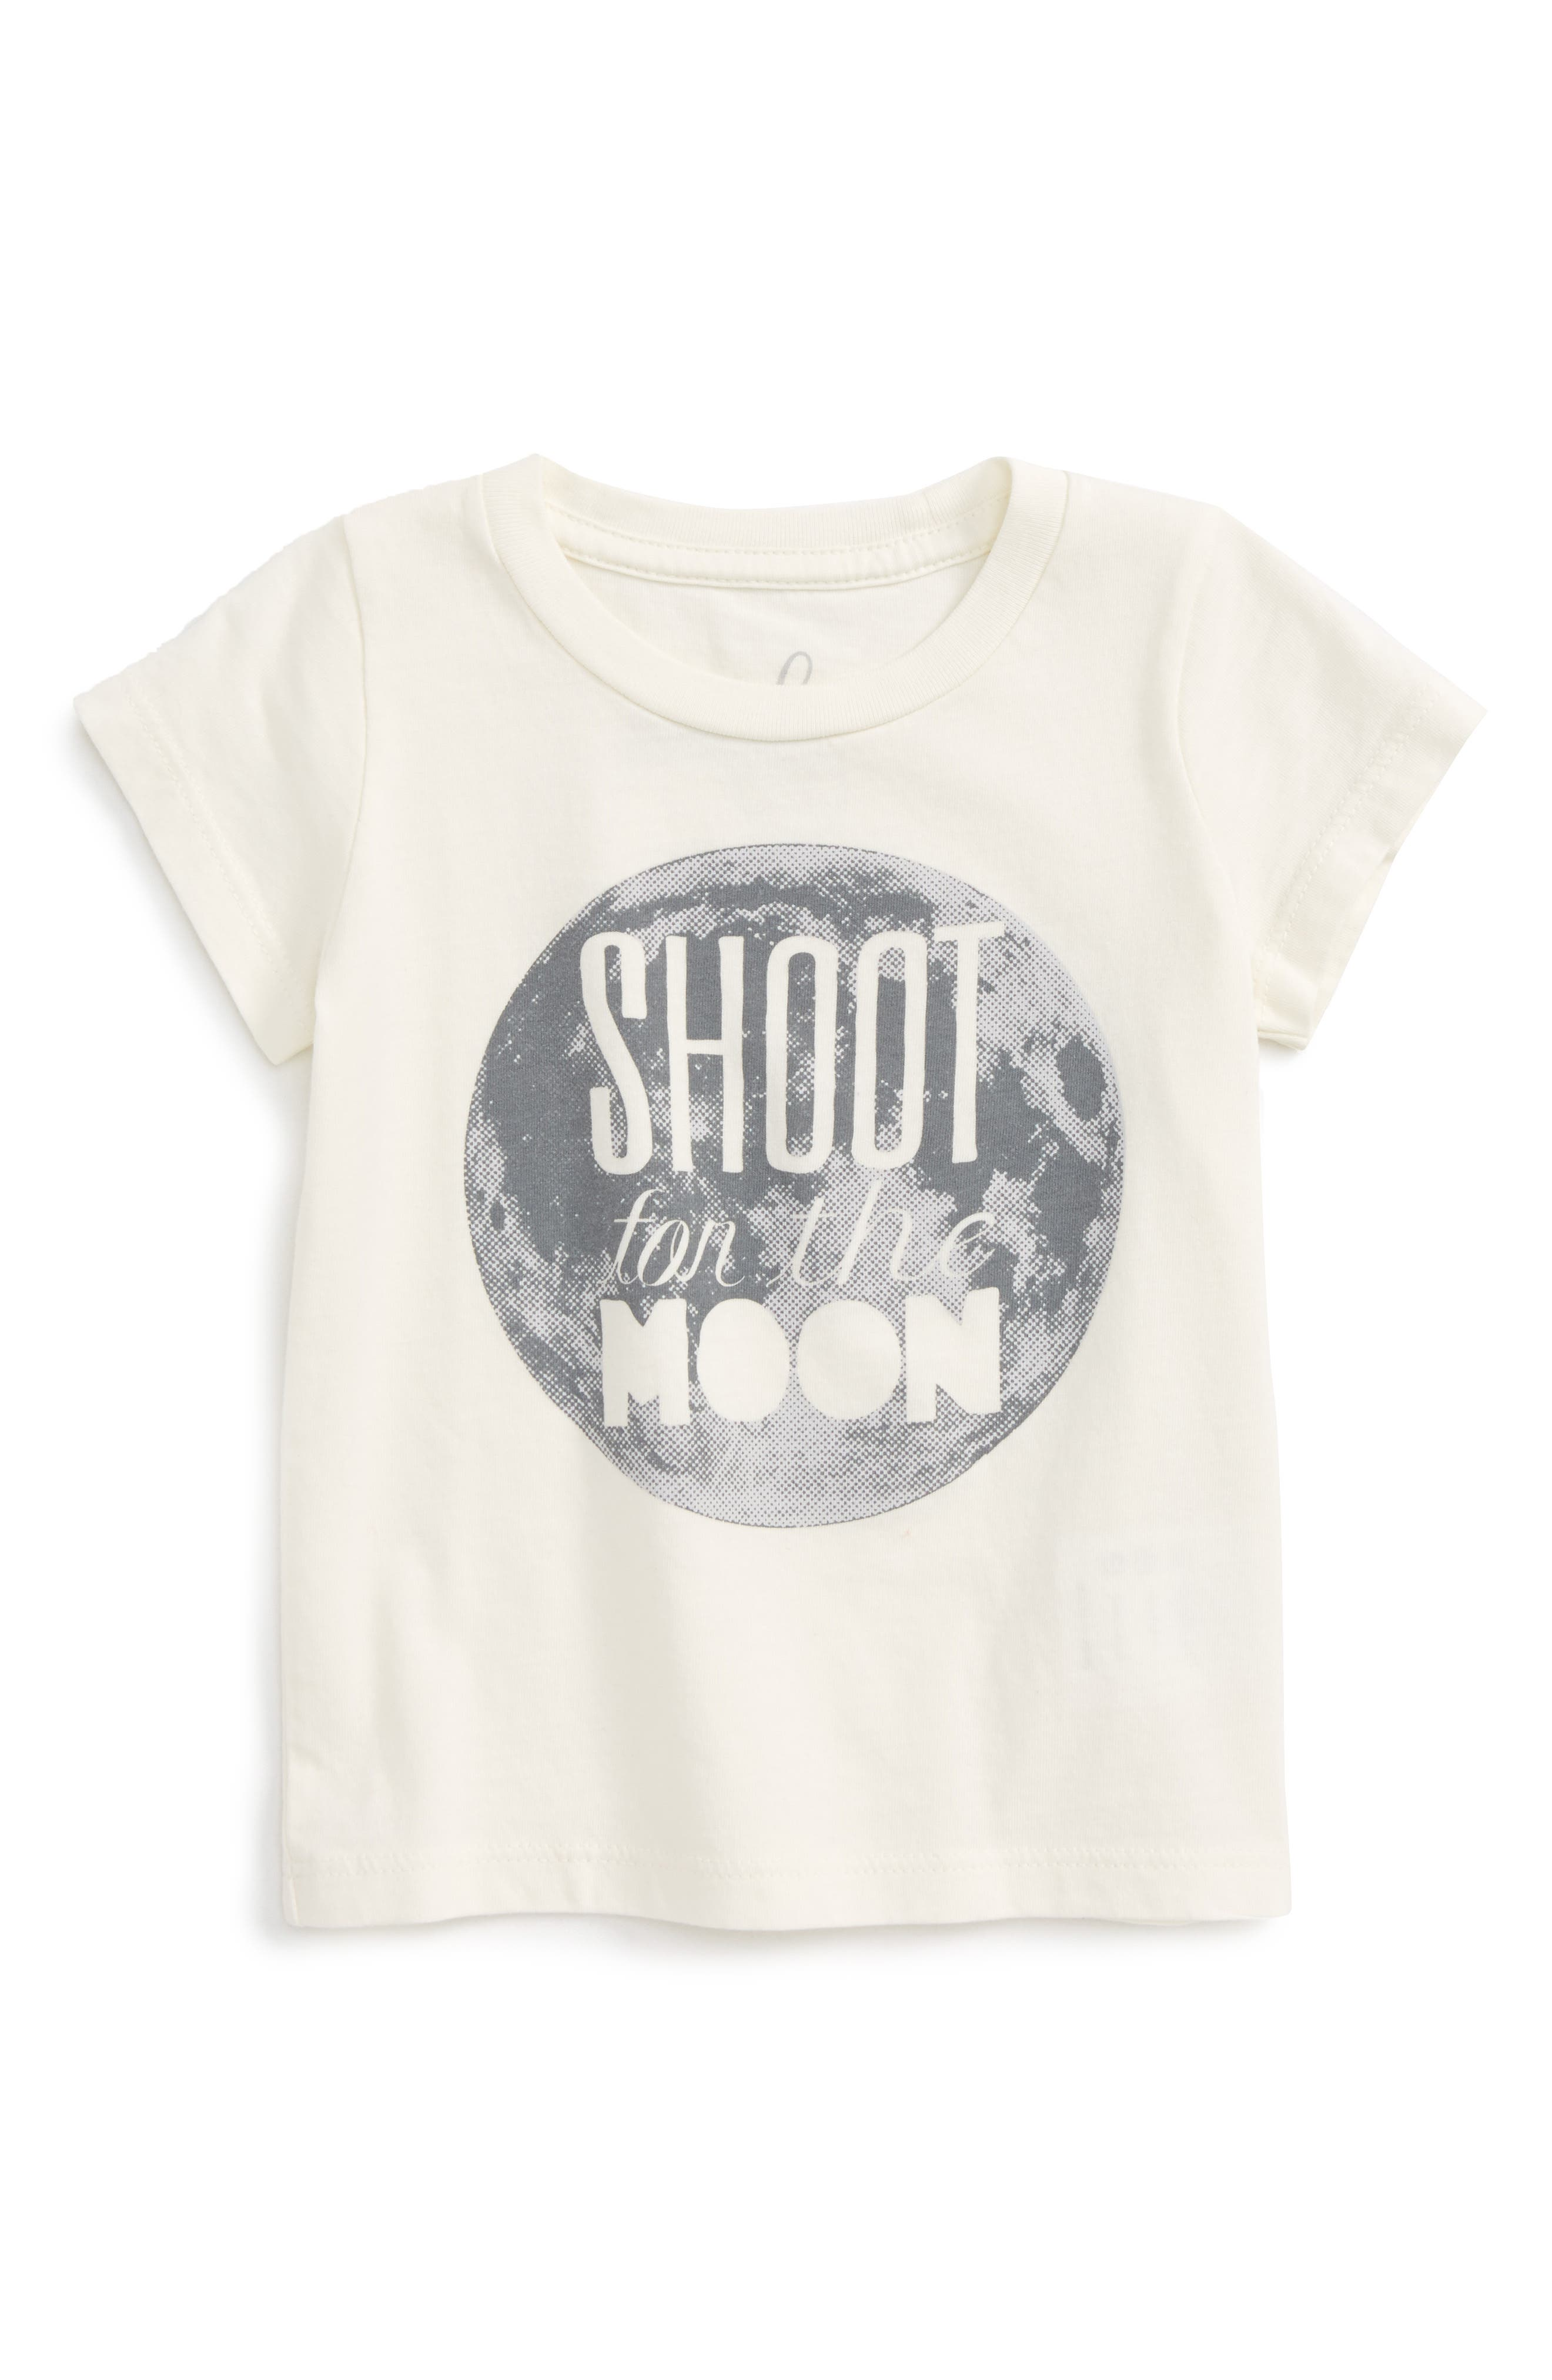 Main Image - Peek Shoot For The Moon Graphic T-Shirt (Baby Boys)